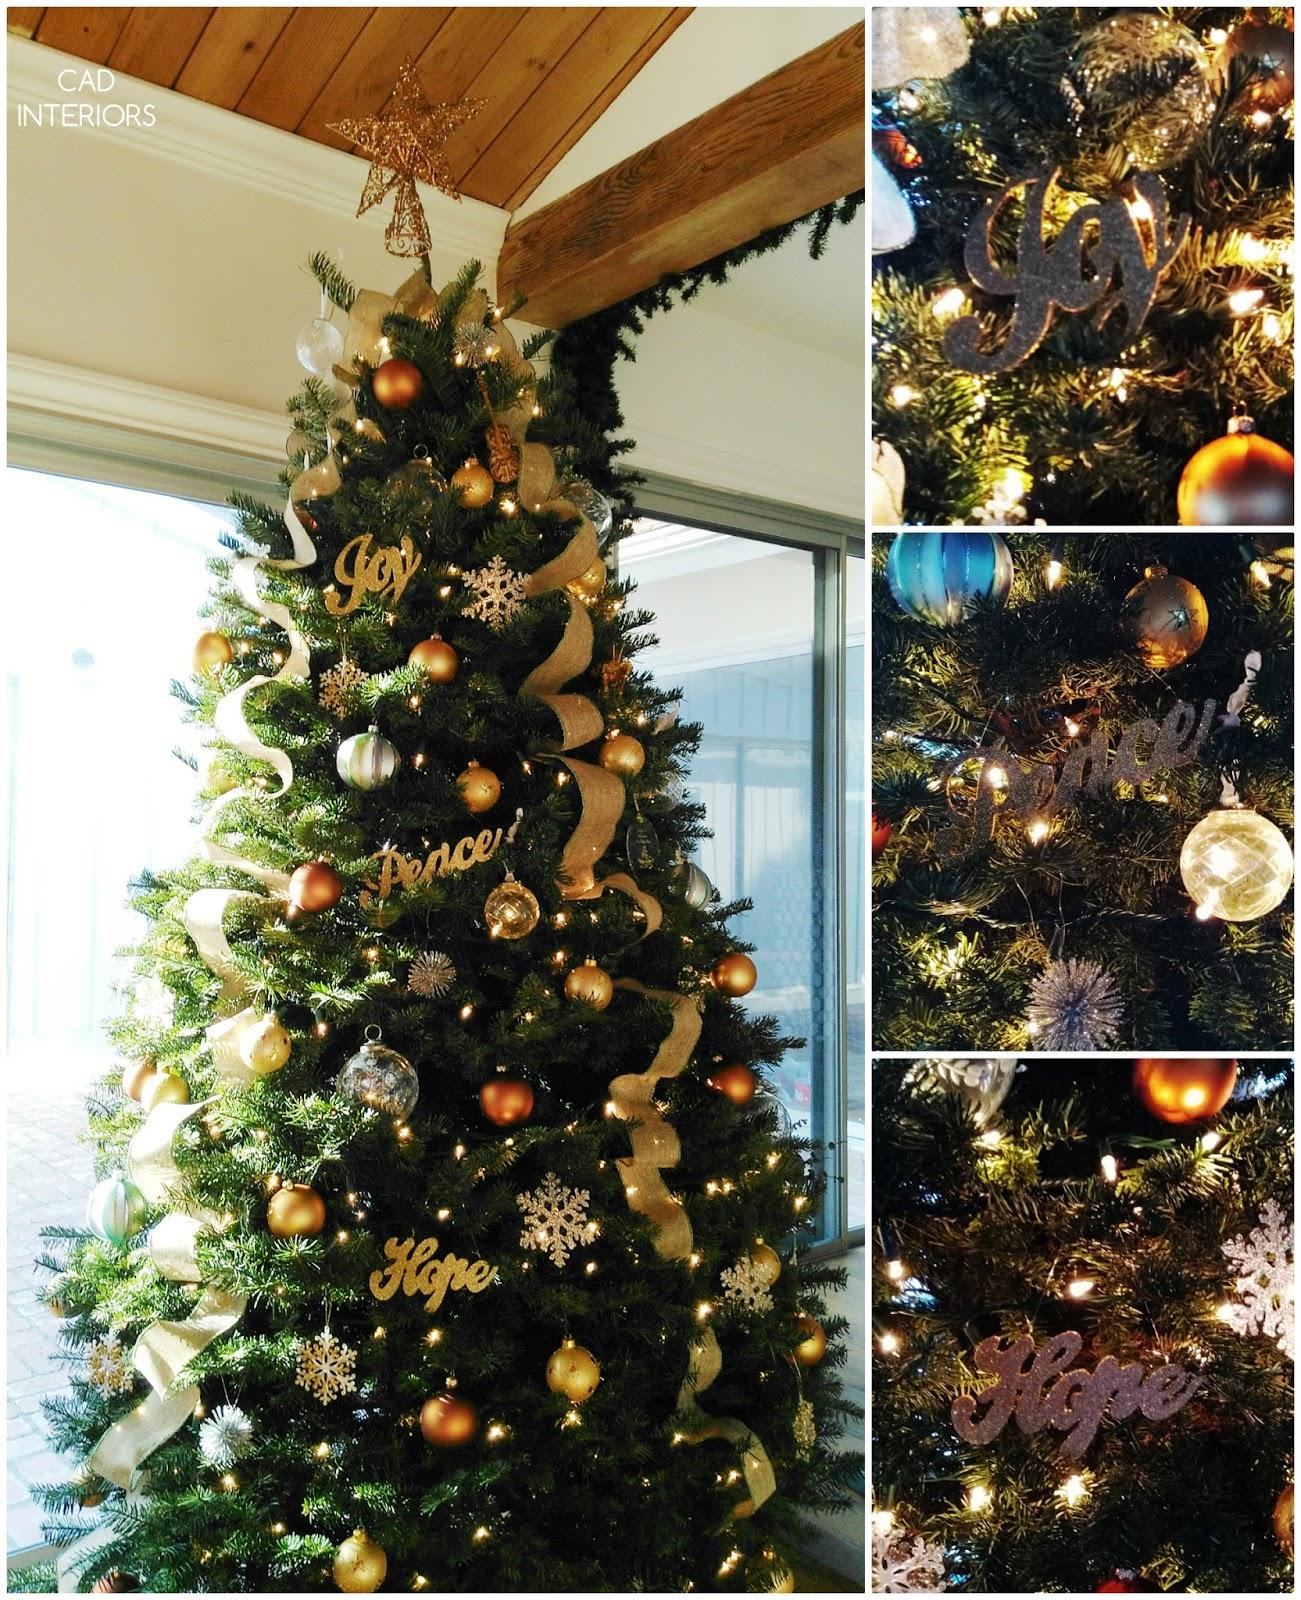 Christmas tree decorations monotone tonal classic holiday decorating